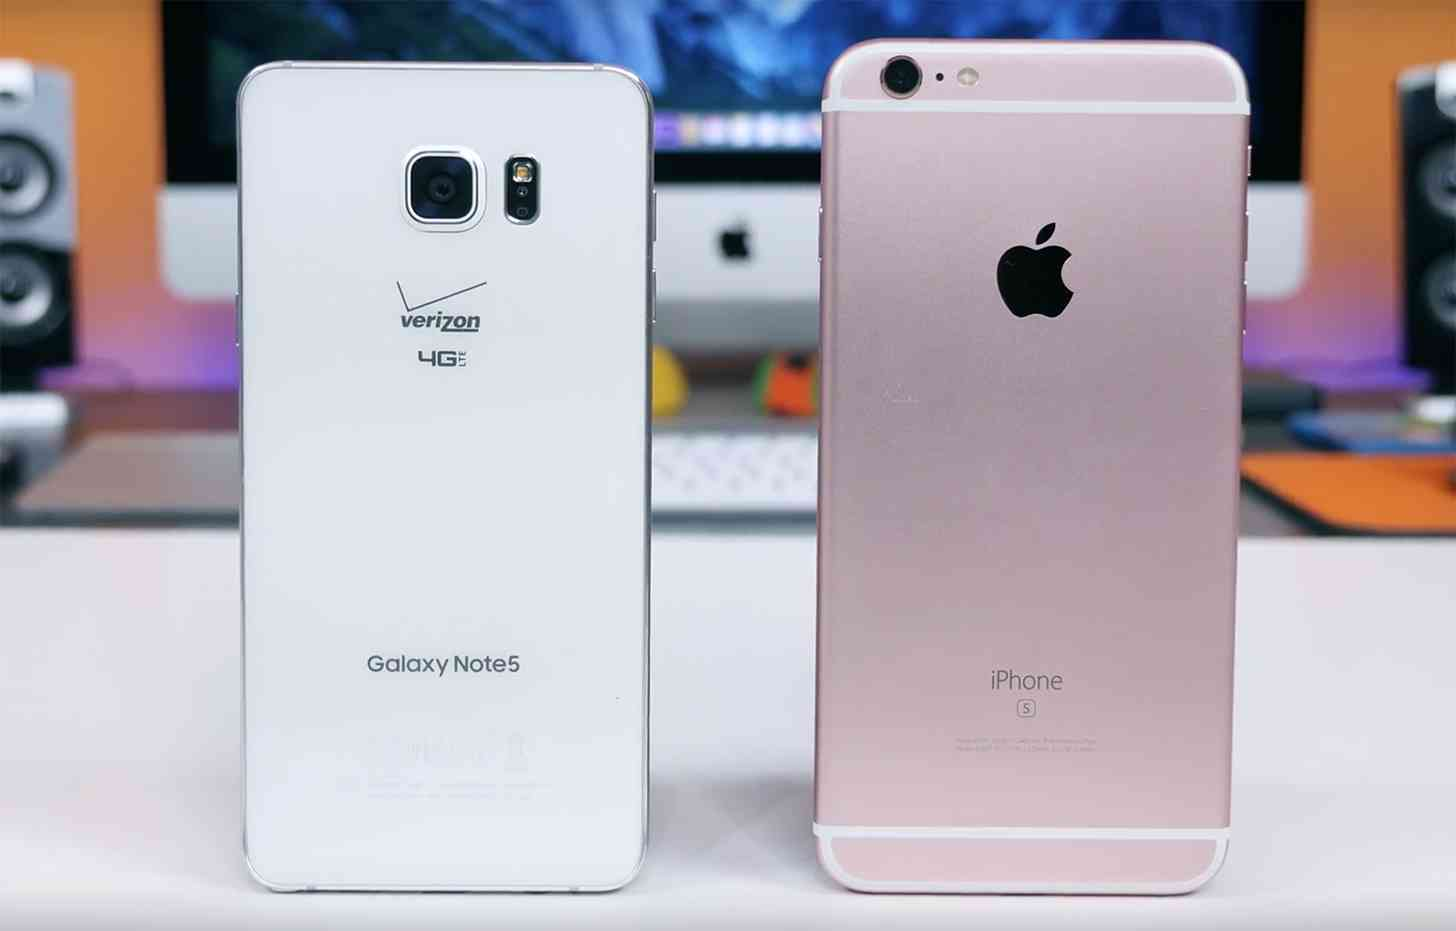 Samsung Galaxy Note 5, Apple iPhone 6s Plus comparison